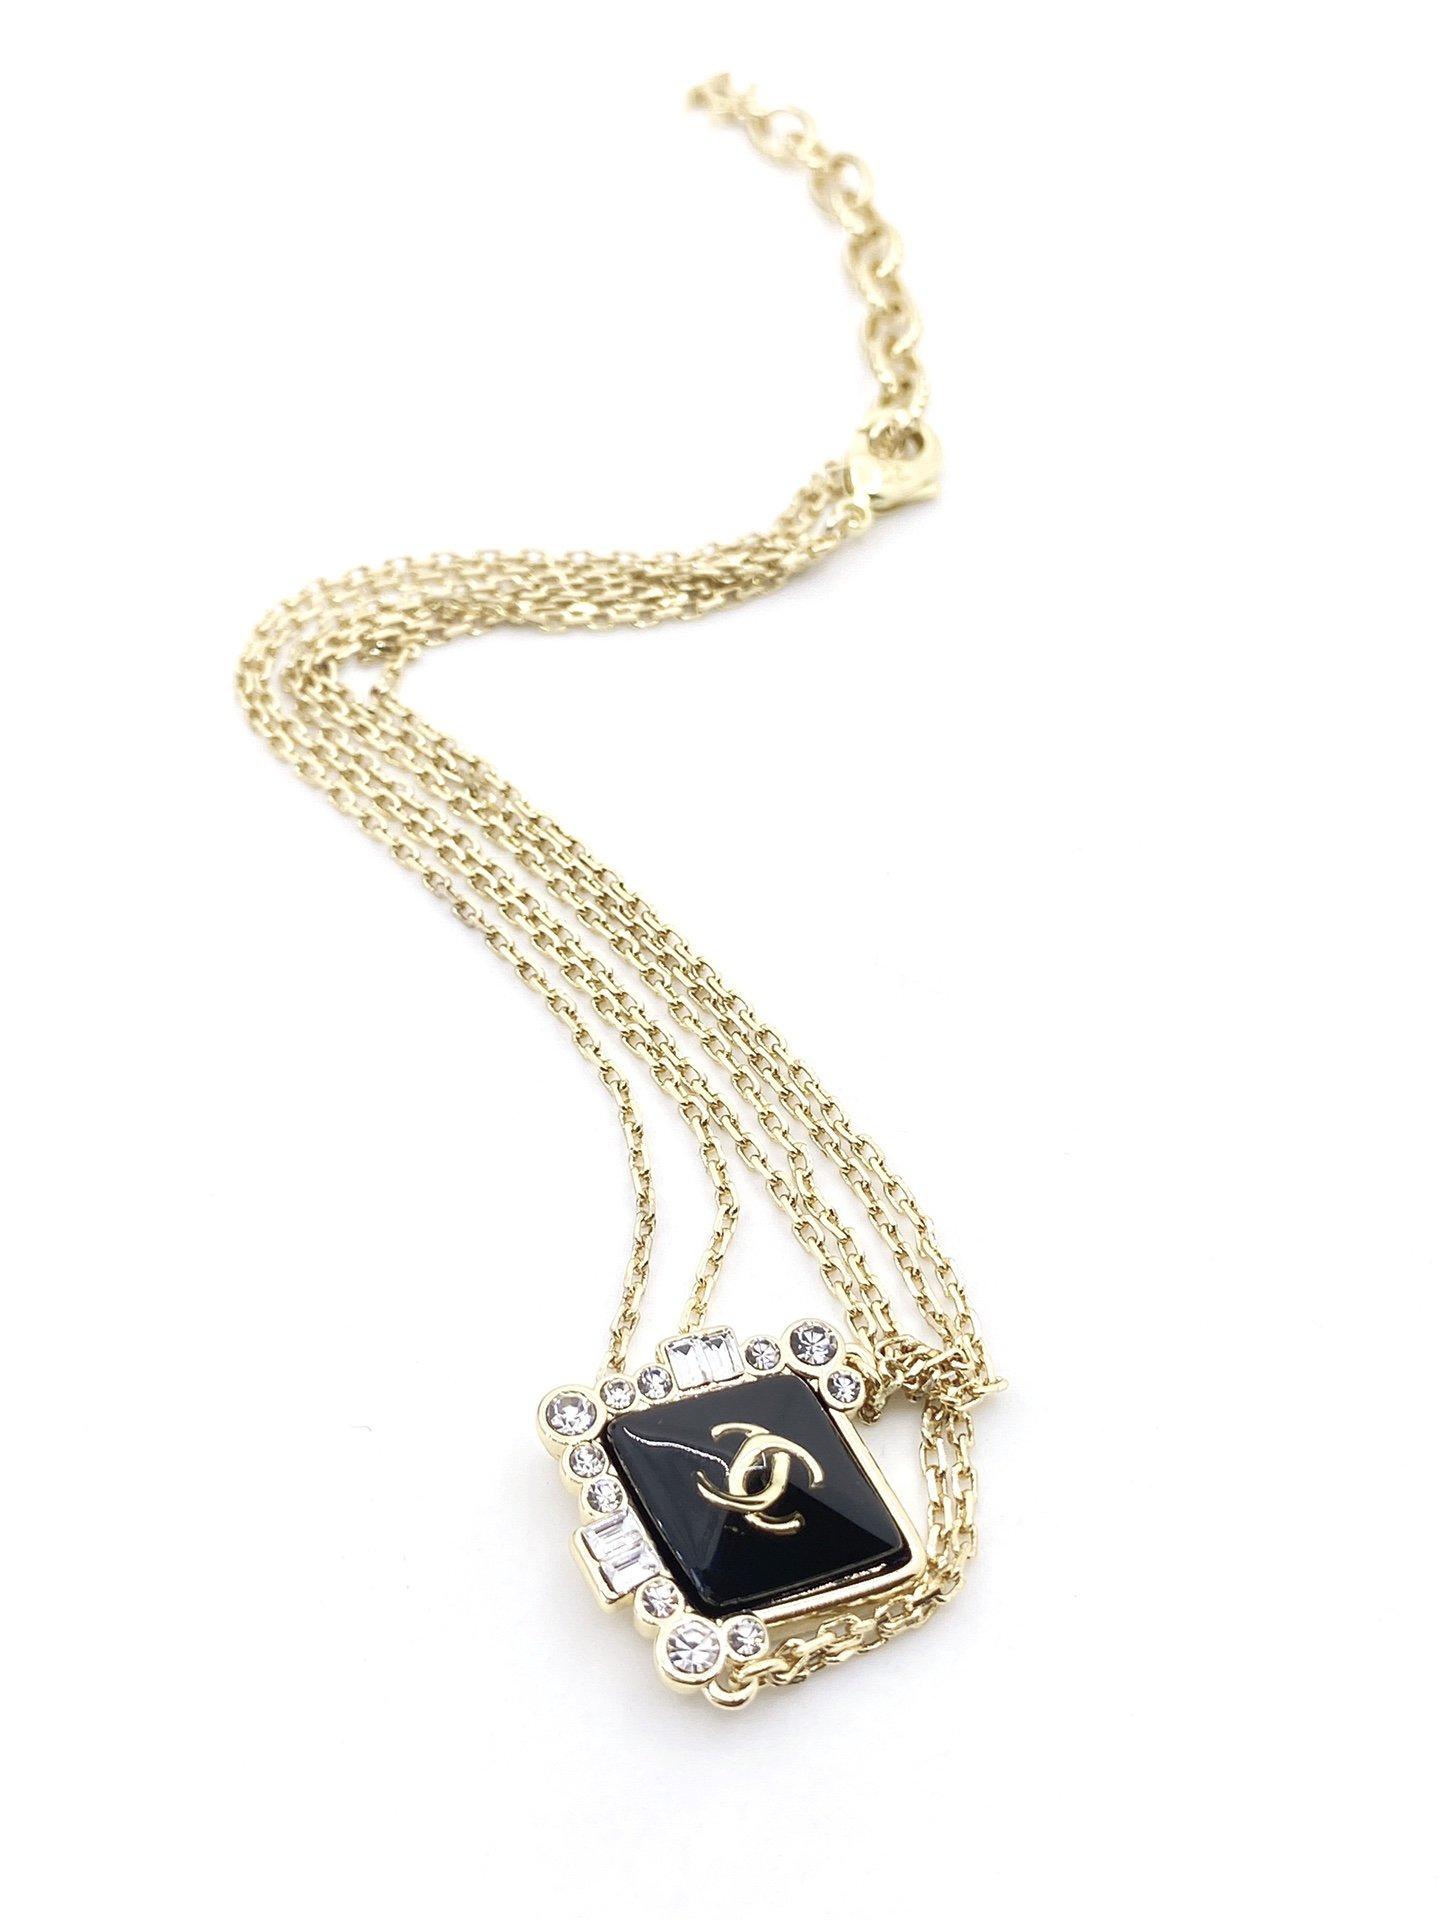 Chanel最新款菱形黑色项链一致Z